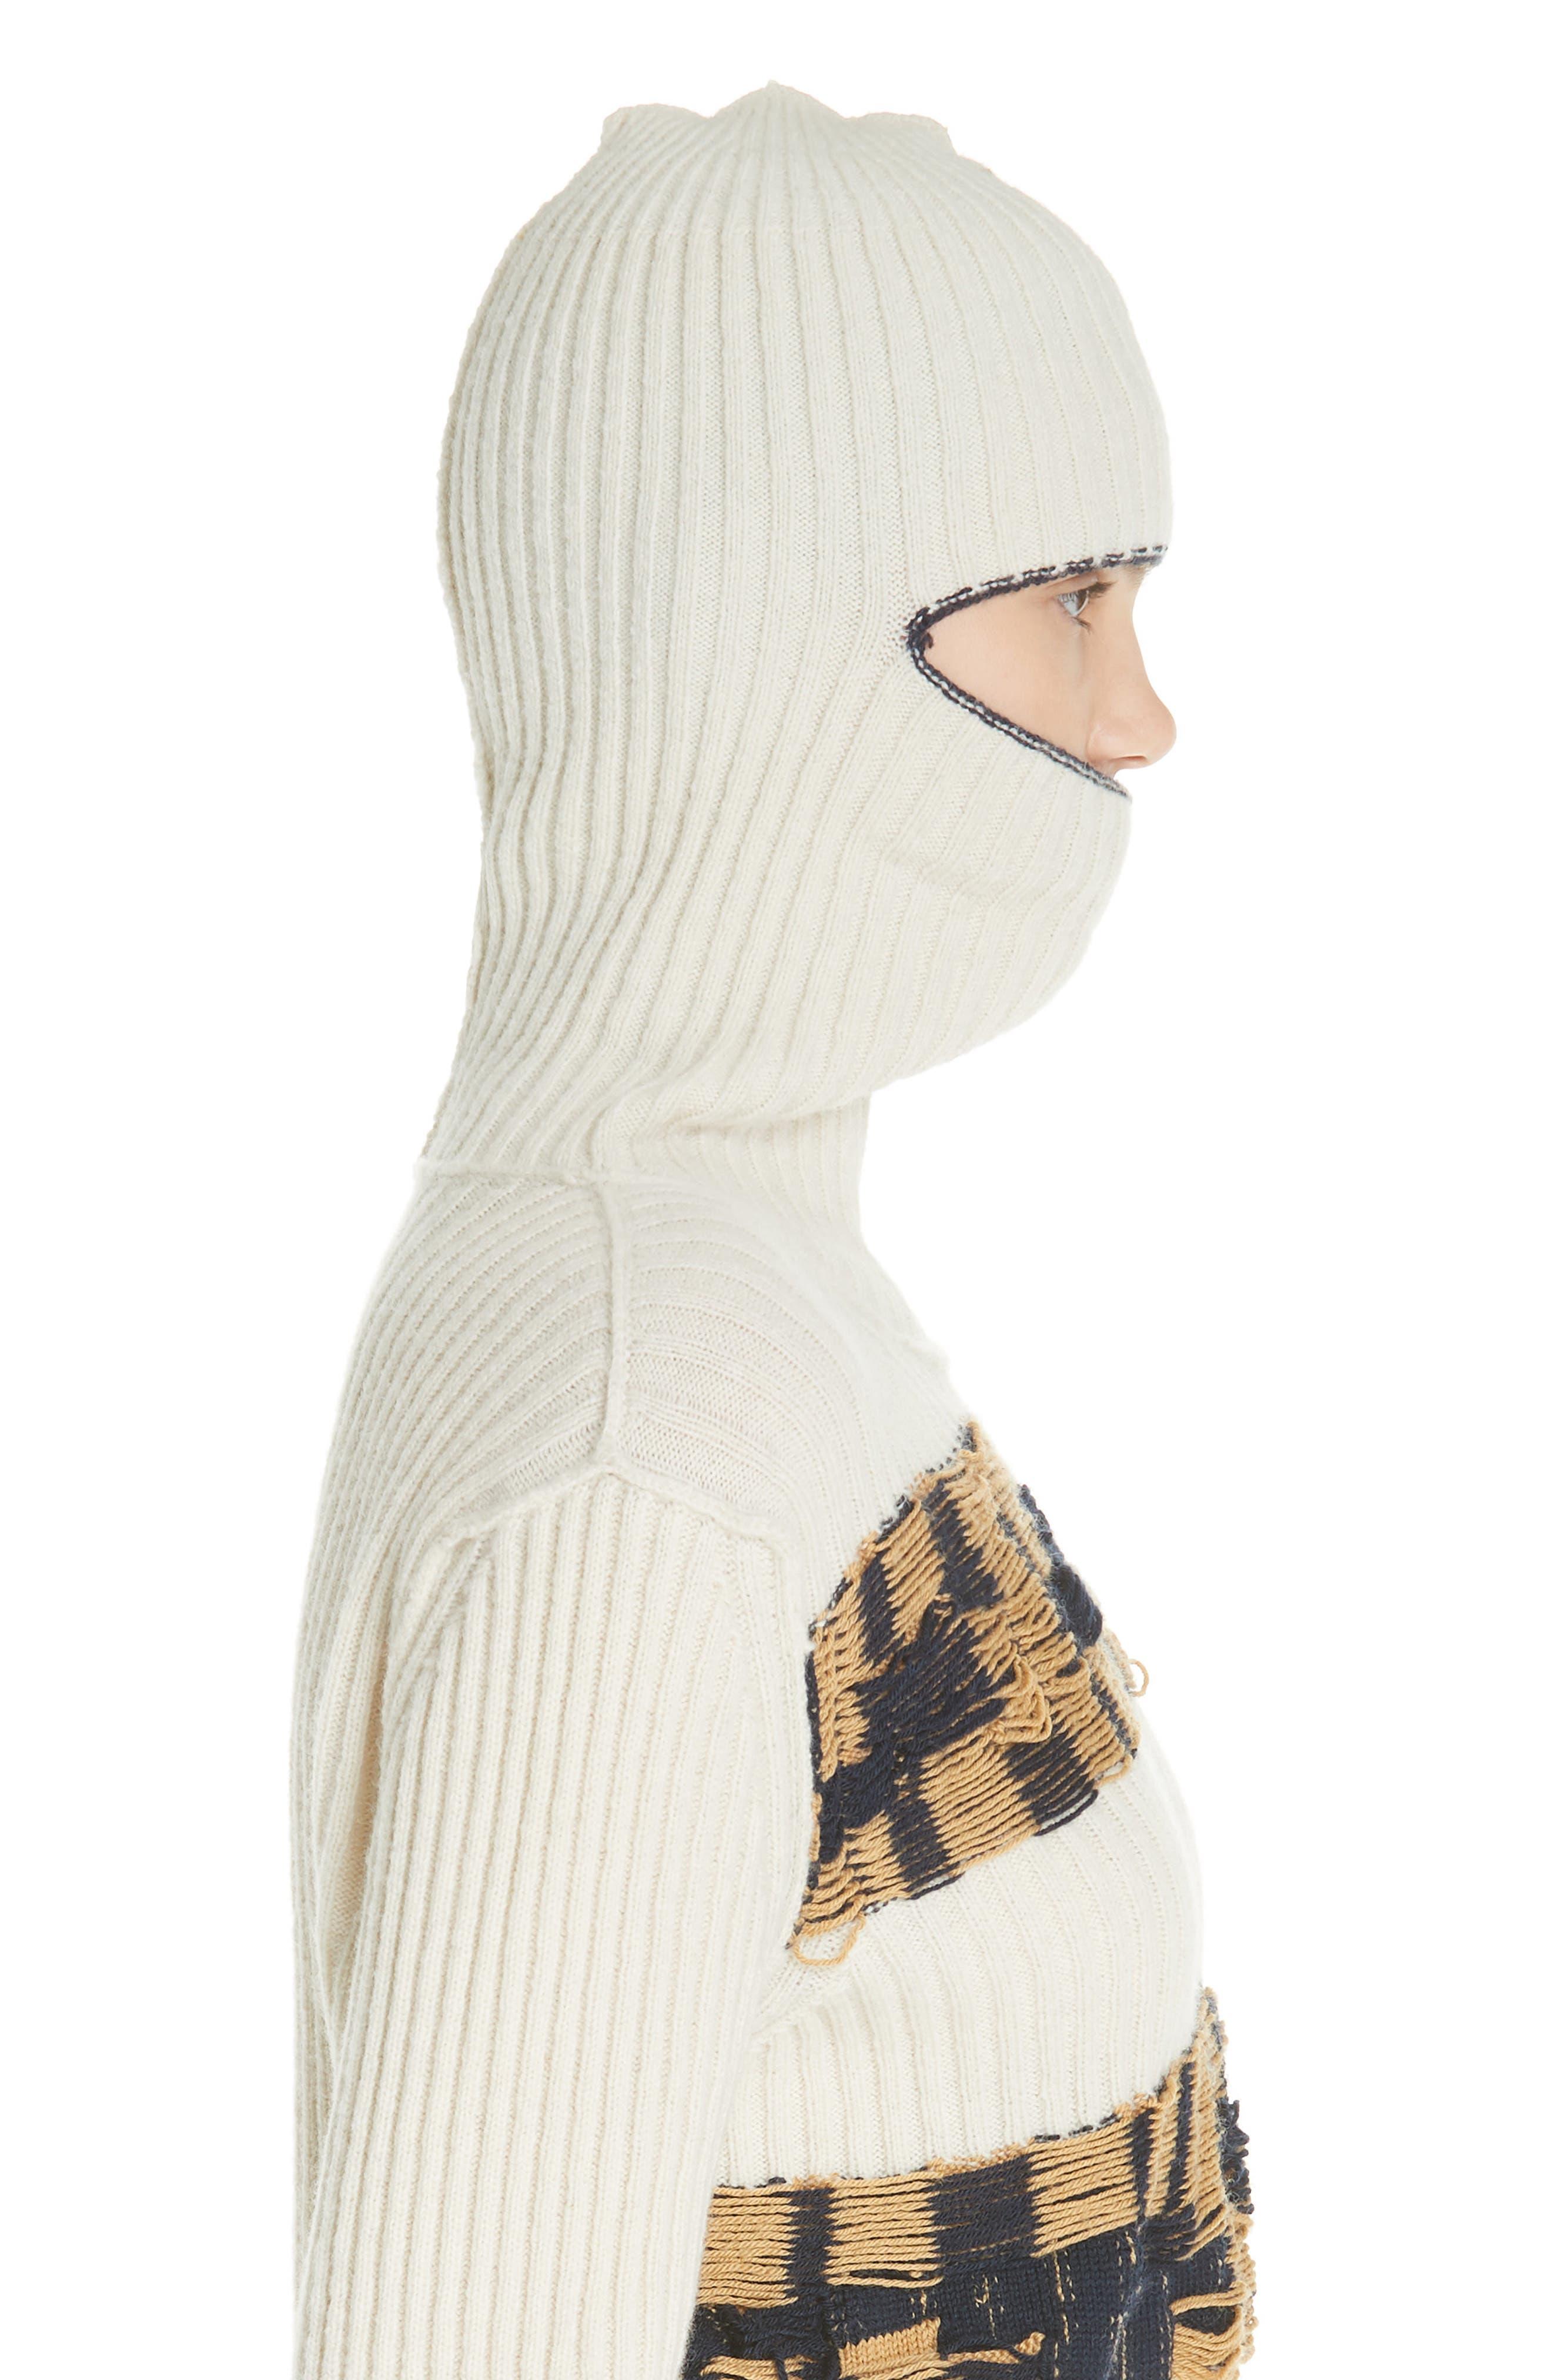 Quilt Jacquard Stripe Sweater,                             Alternate thumbnail 4, color,                             ECRU HAY NAVY